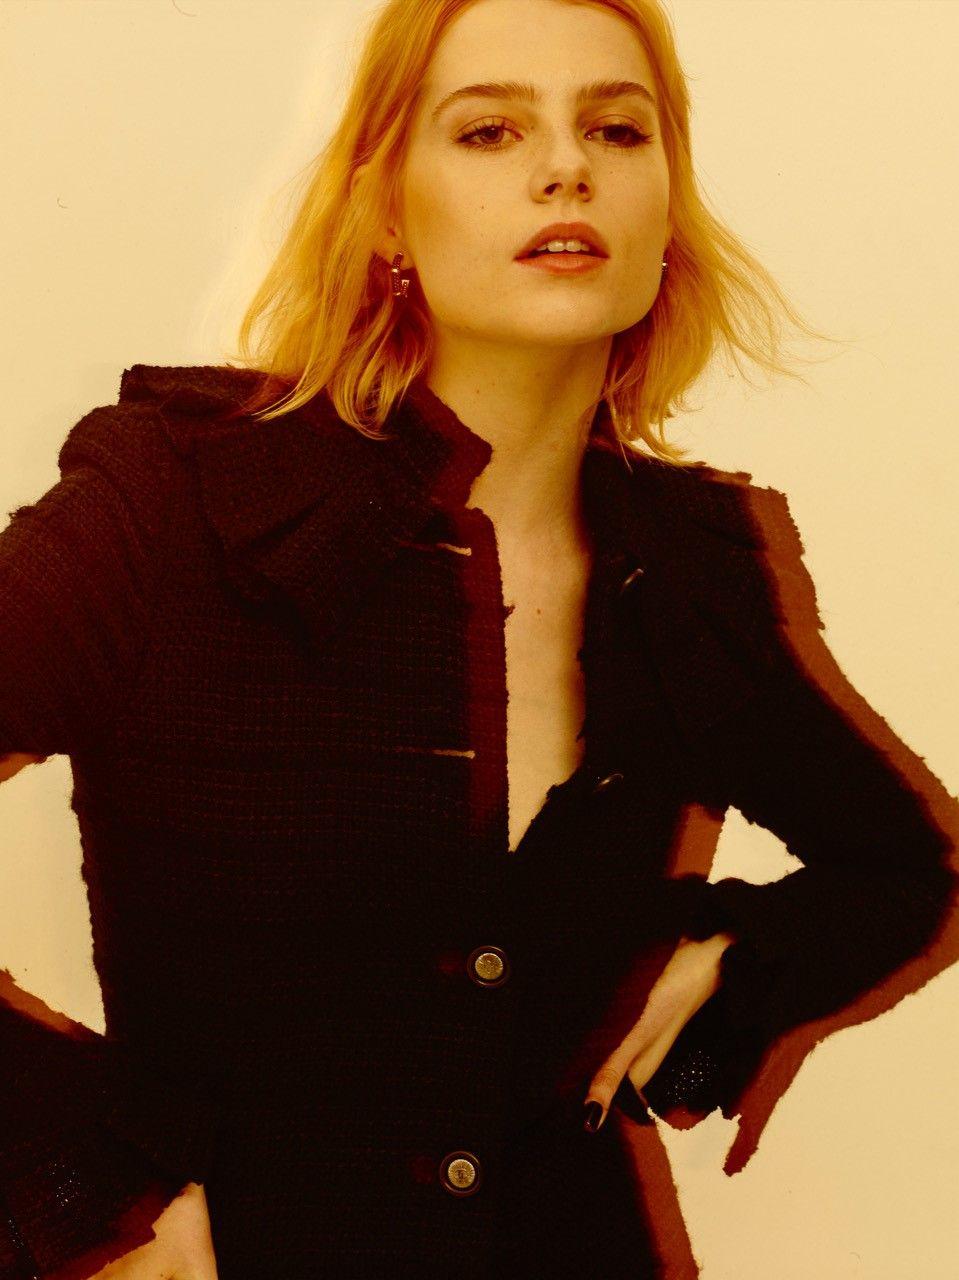 pics Madeline Duggan (born 1994)